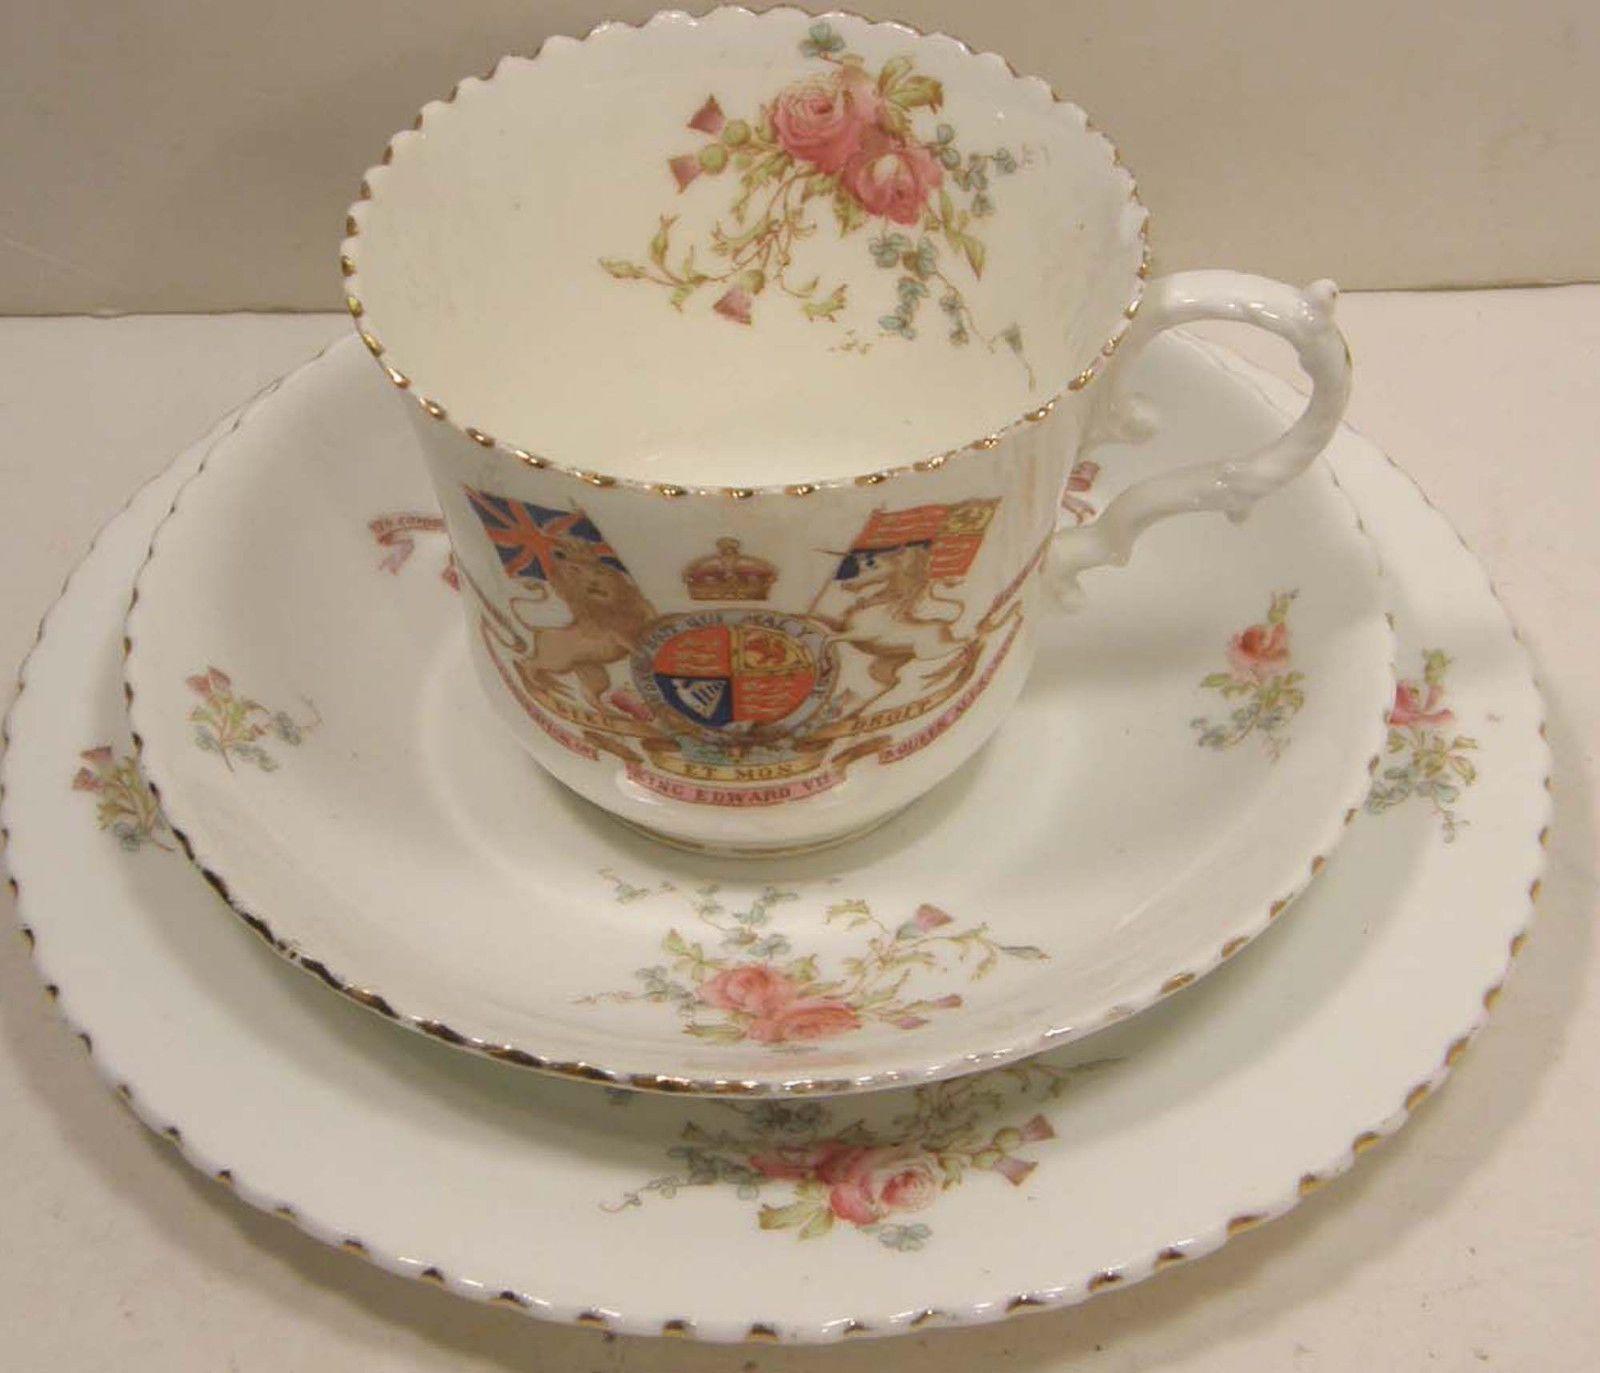 1902 EDWARDIAN AYNSLEY BONE CHINA CUP SAUCER & PLATE